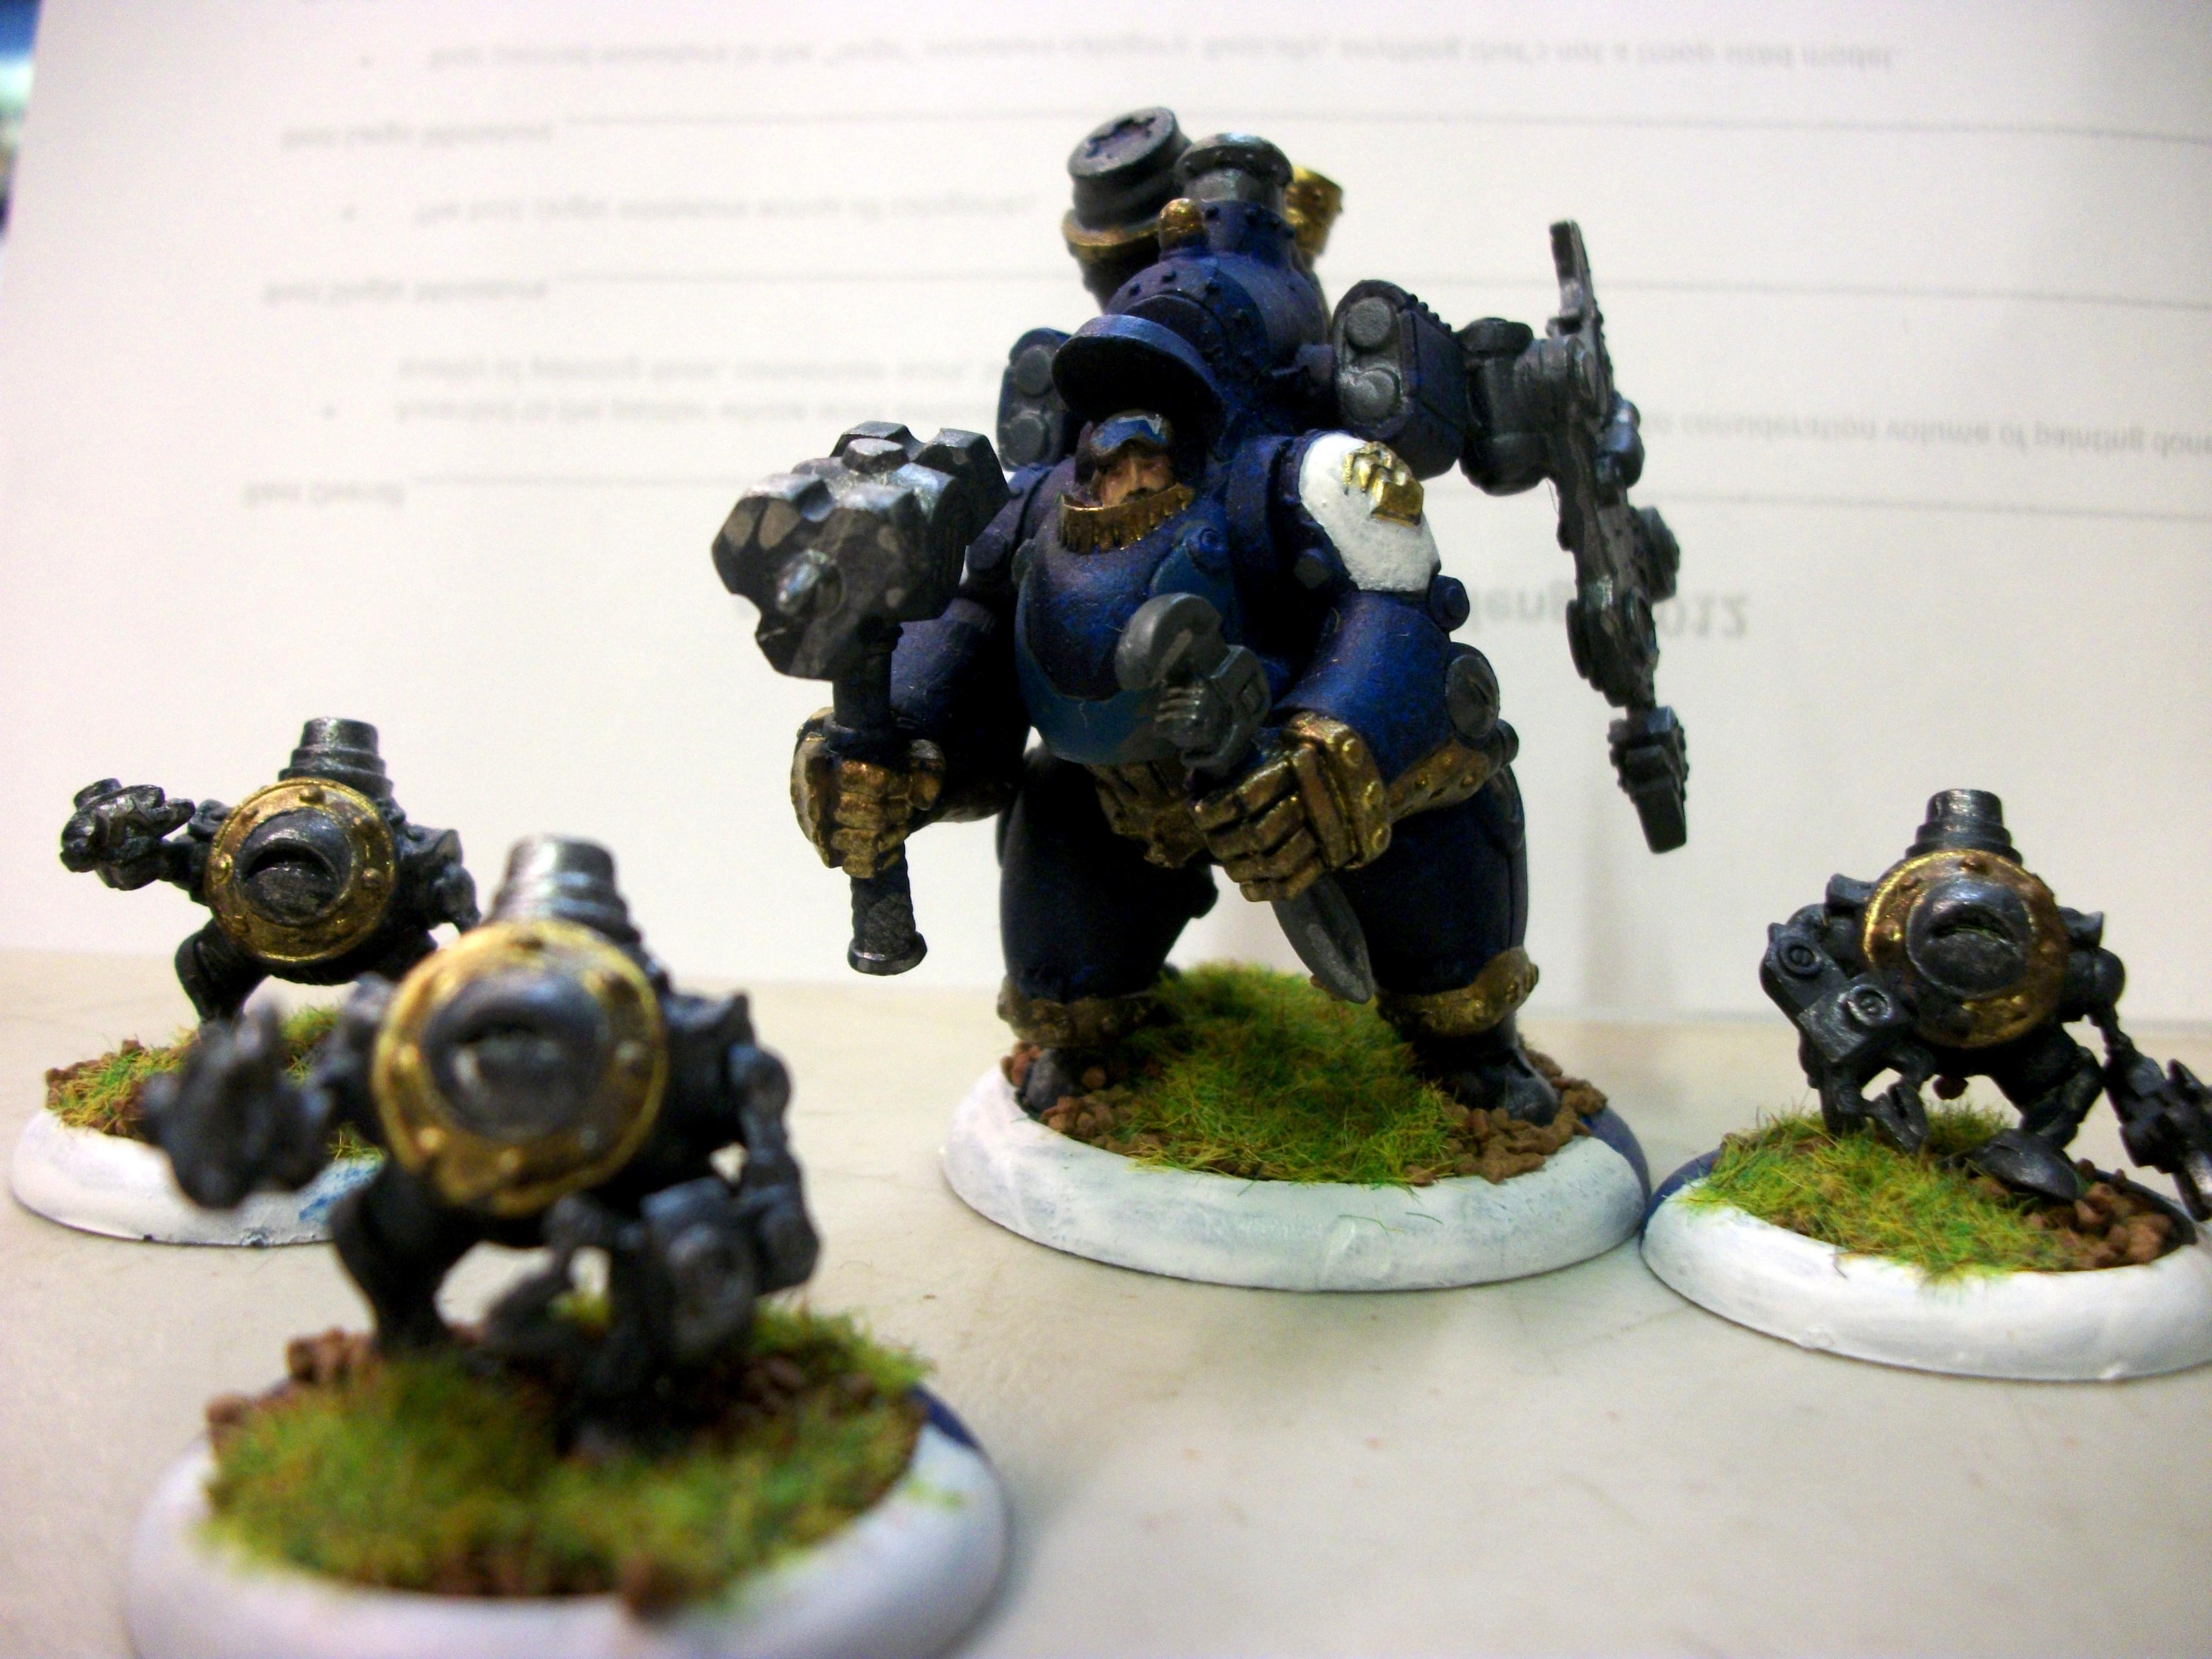 Cygnar, Darius, Warmachine